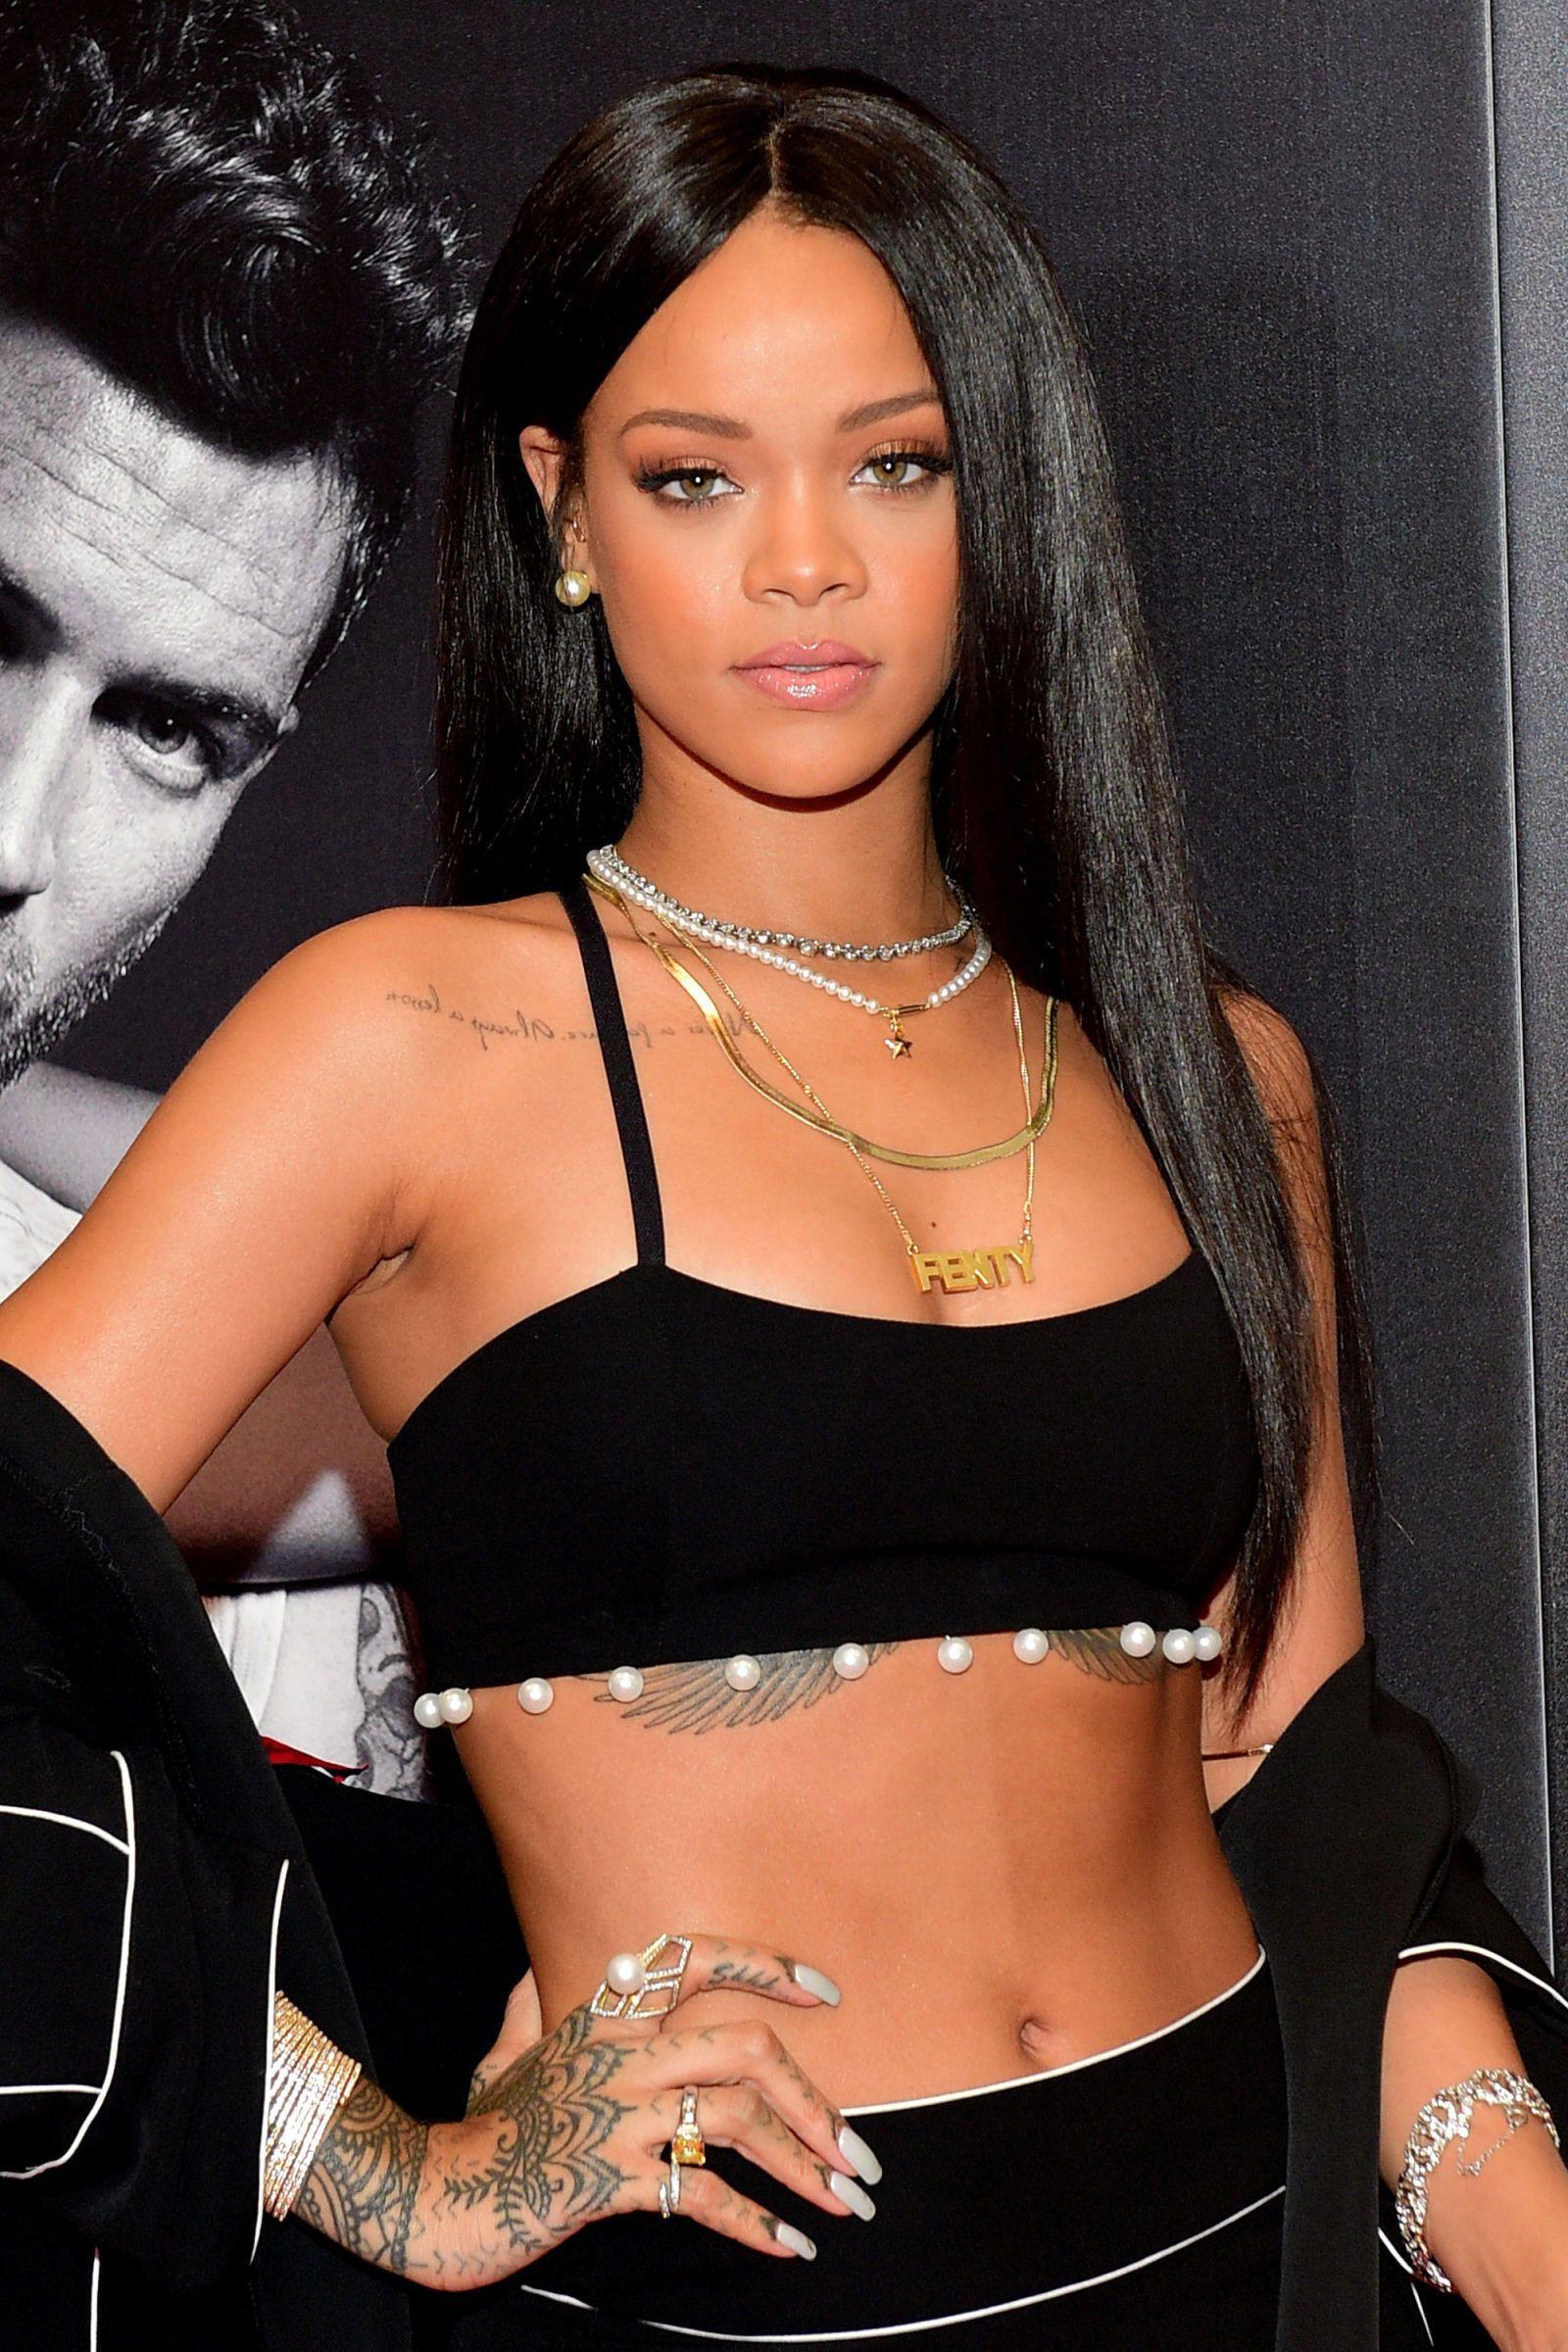 Superb choice of rihanna october 25, Rogue by Rihanna